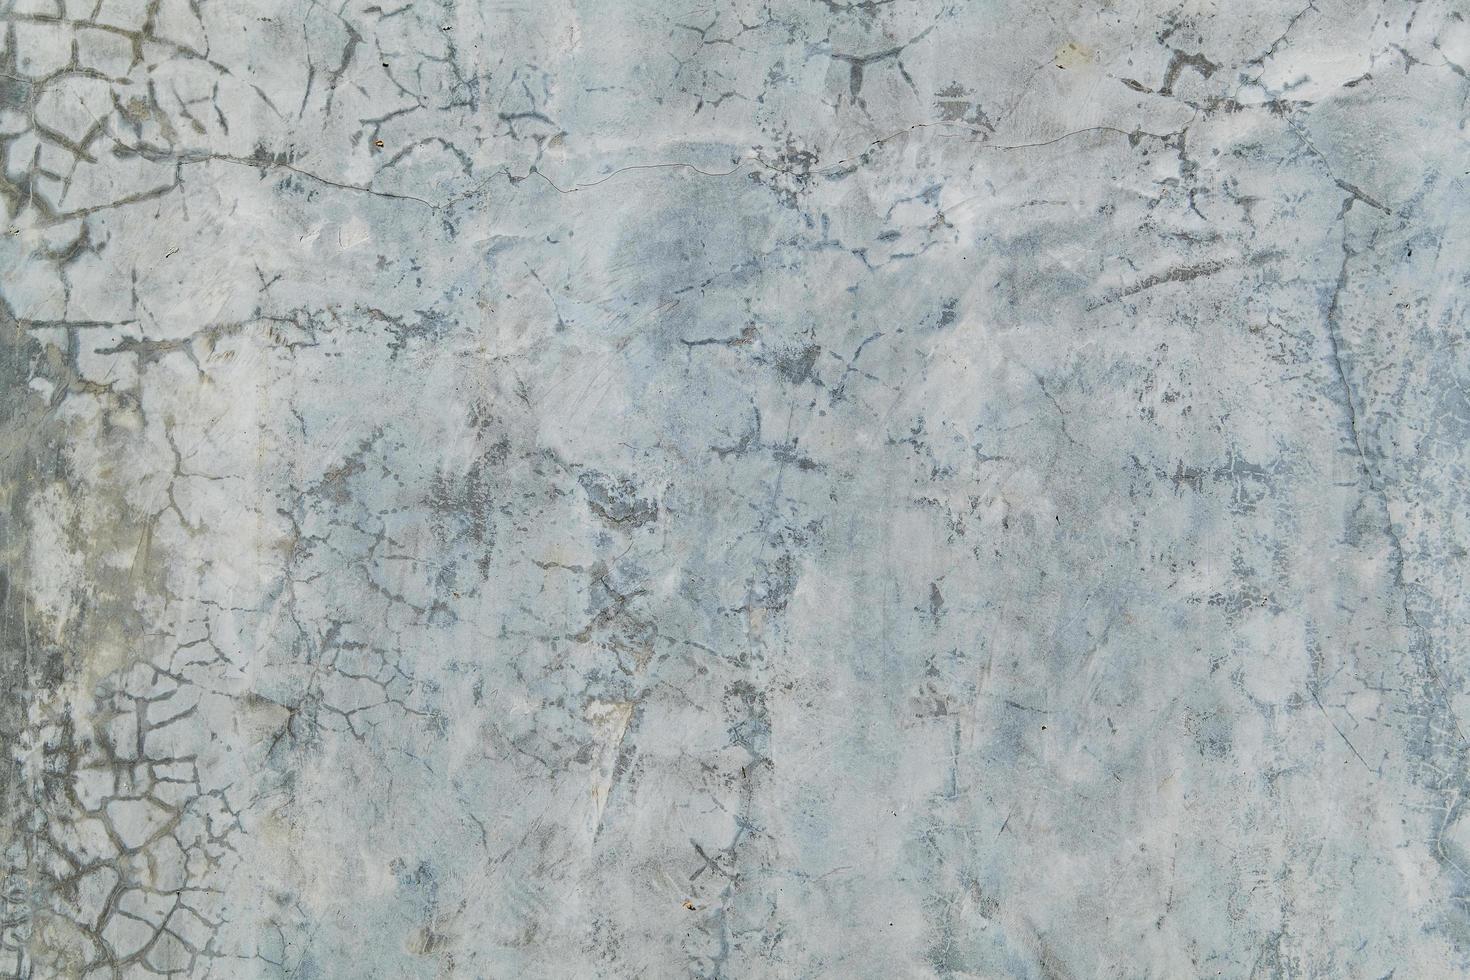 Grunge concrete wall texture background. photo